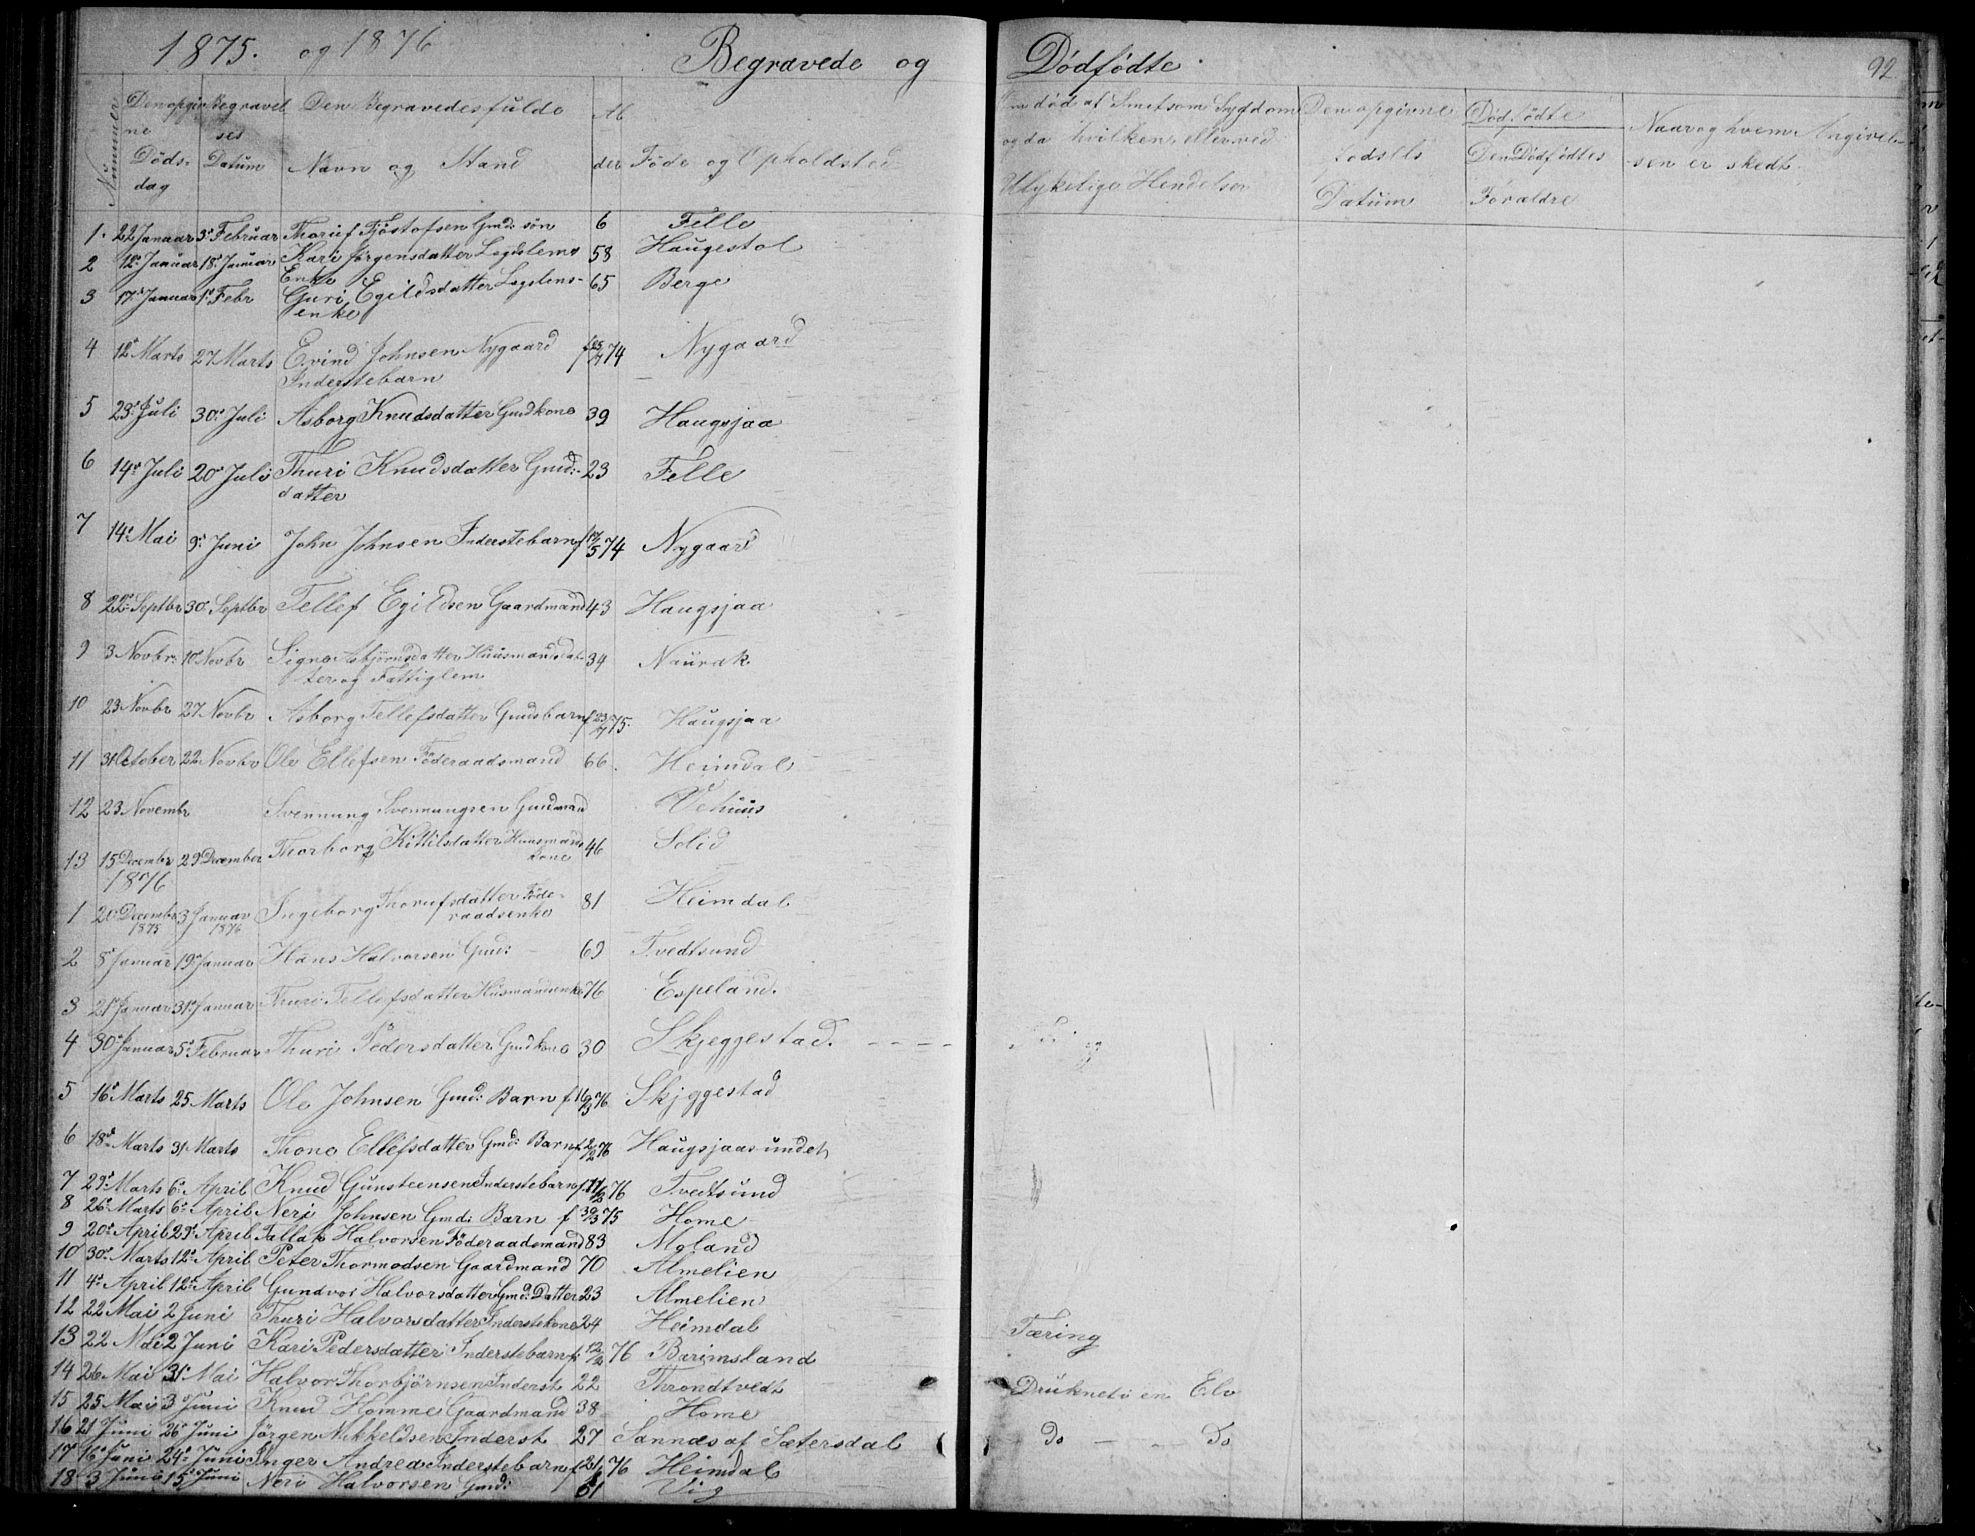 SAKO, Nissedal kirkebøker, G/Gb/L0002: Klokkerbok nr. II 2, 1863-1892, s. 92